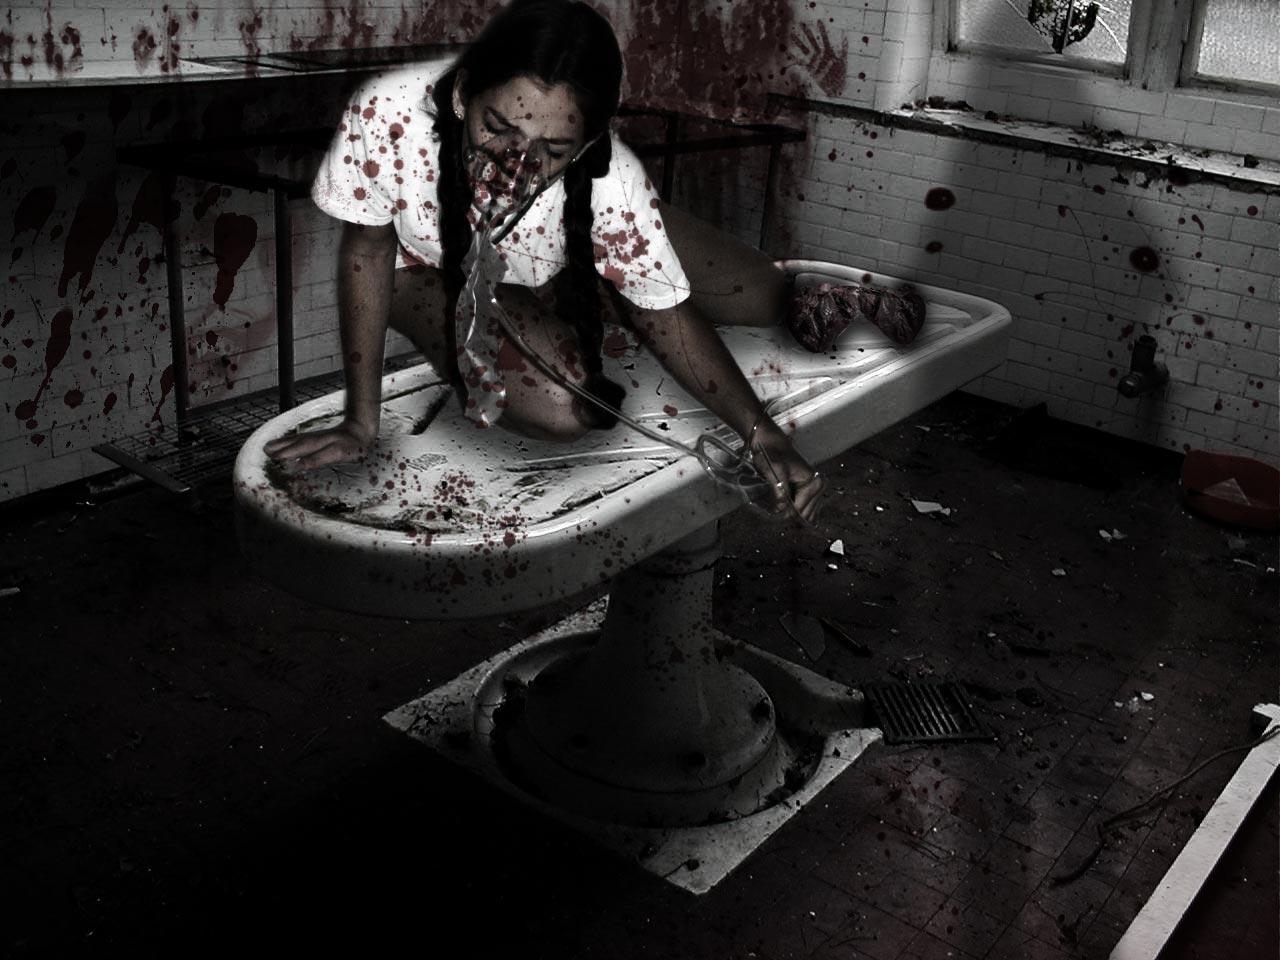 Sixse horror image hentai movies